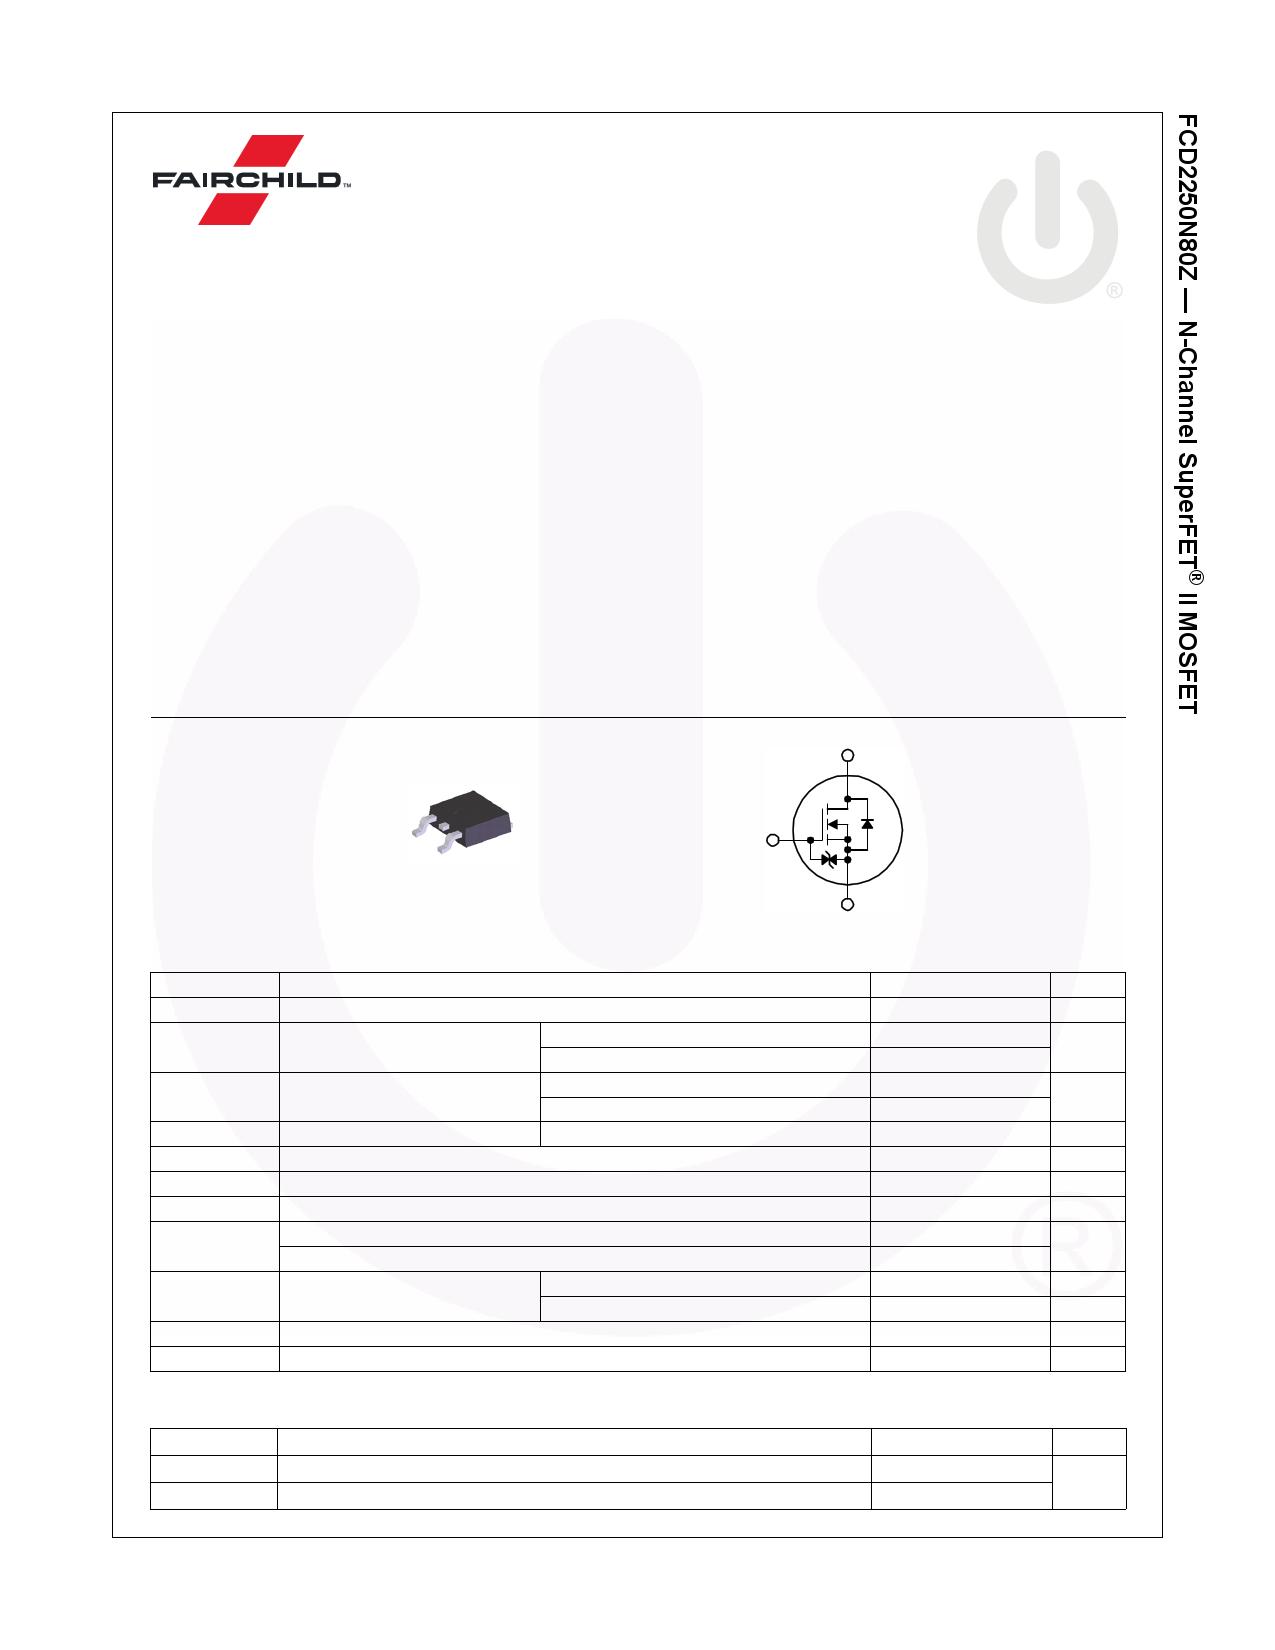 FCD2250N80Z datasheet